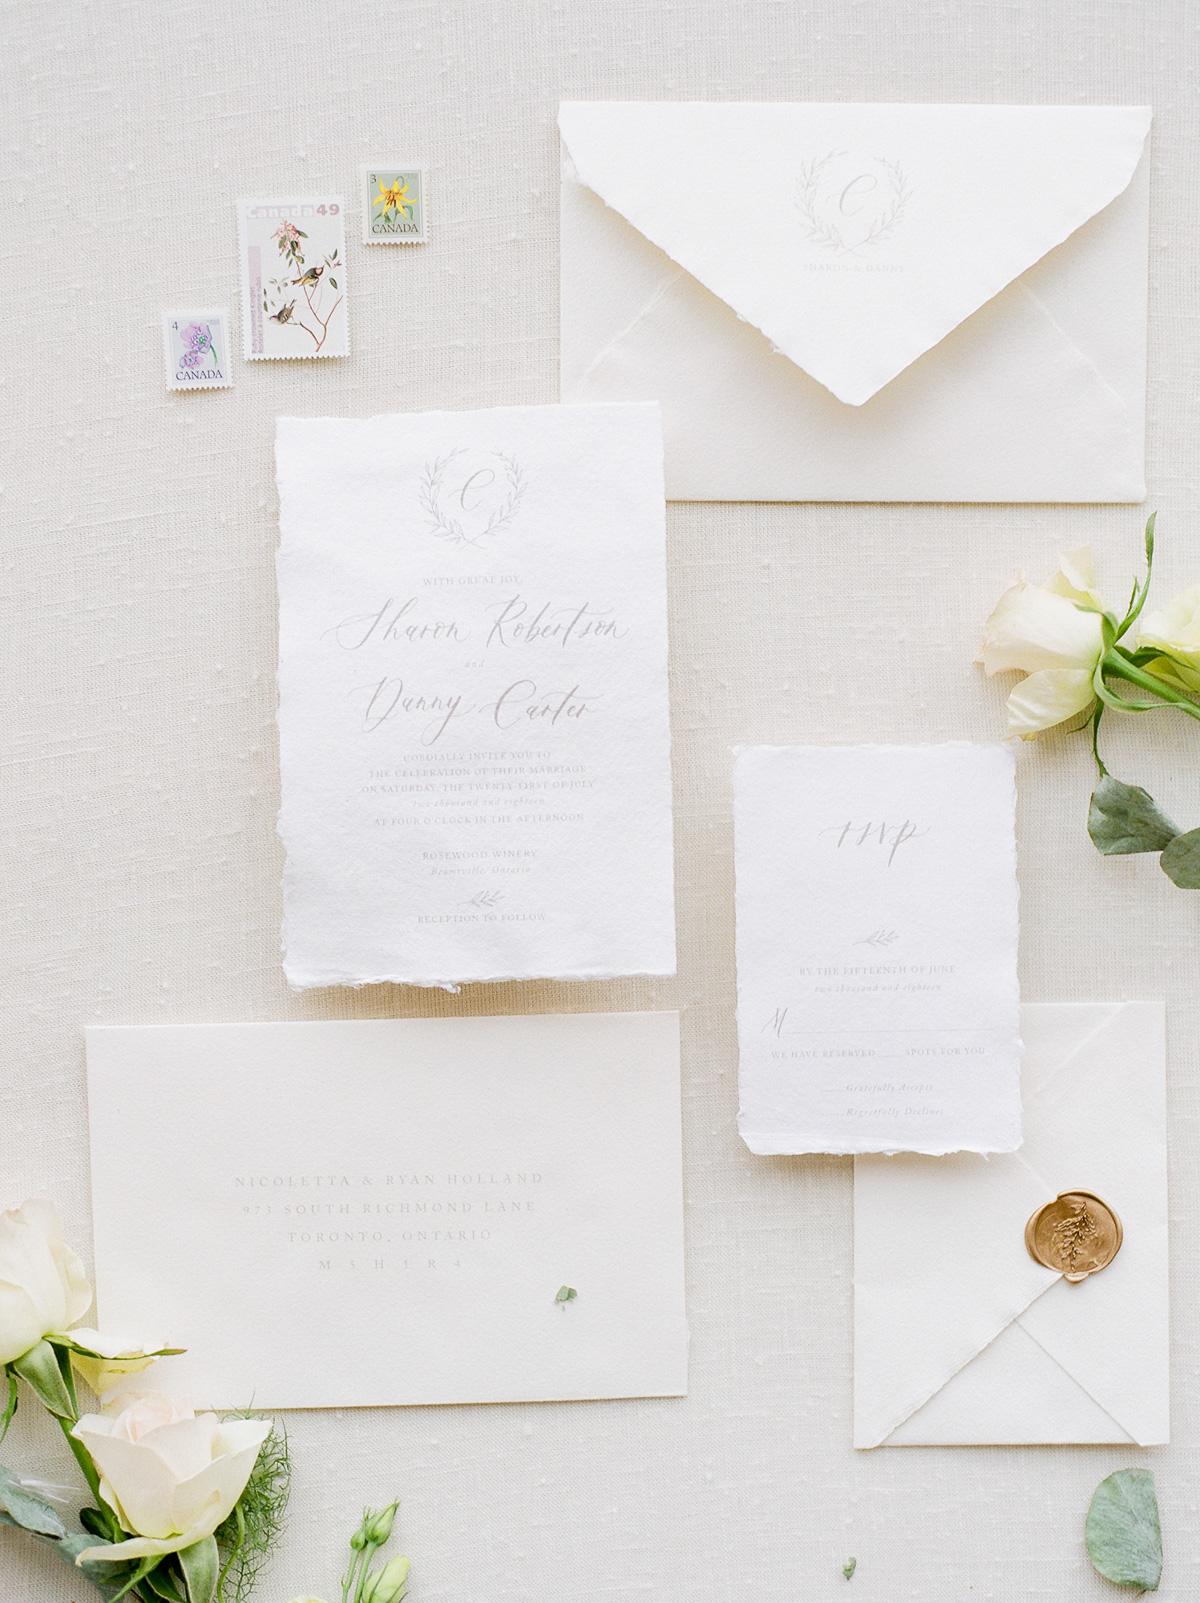 jennifer-xu-photography-vineyard-bride-swish-list-rosewod-eatstes-winery-beamsville-wedding-editorial-24.jpg